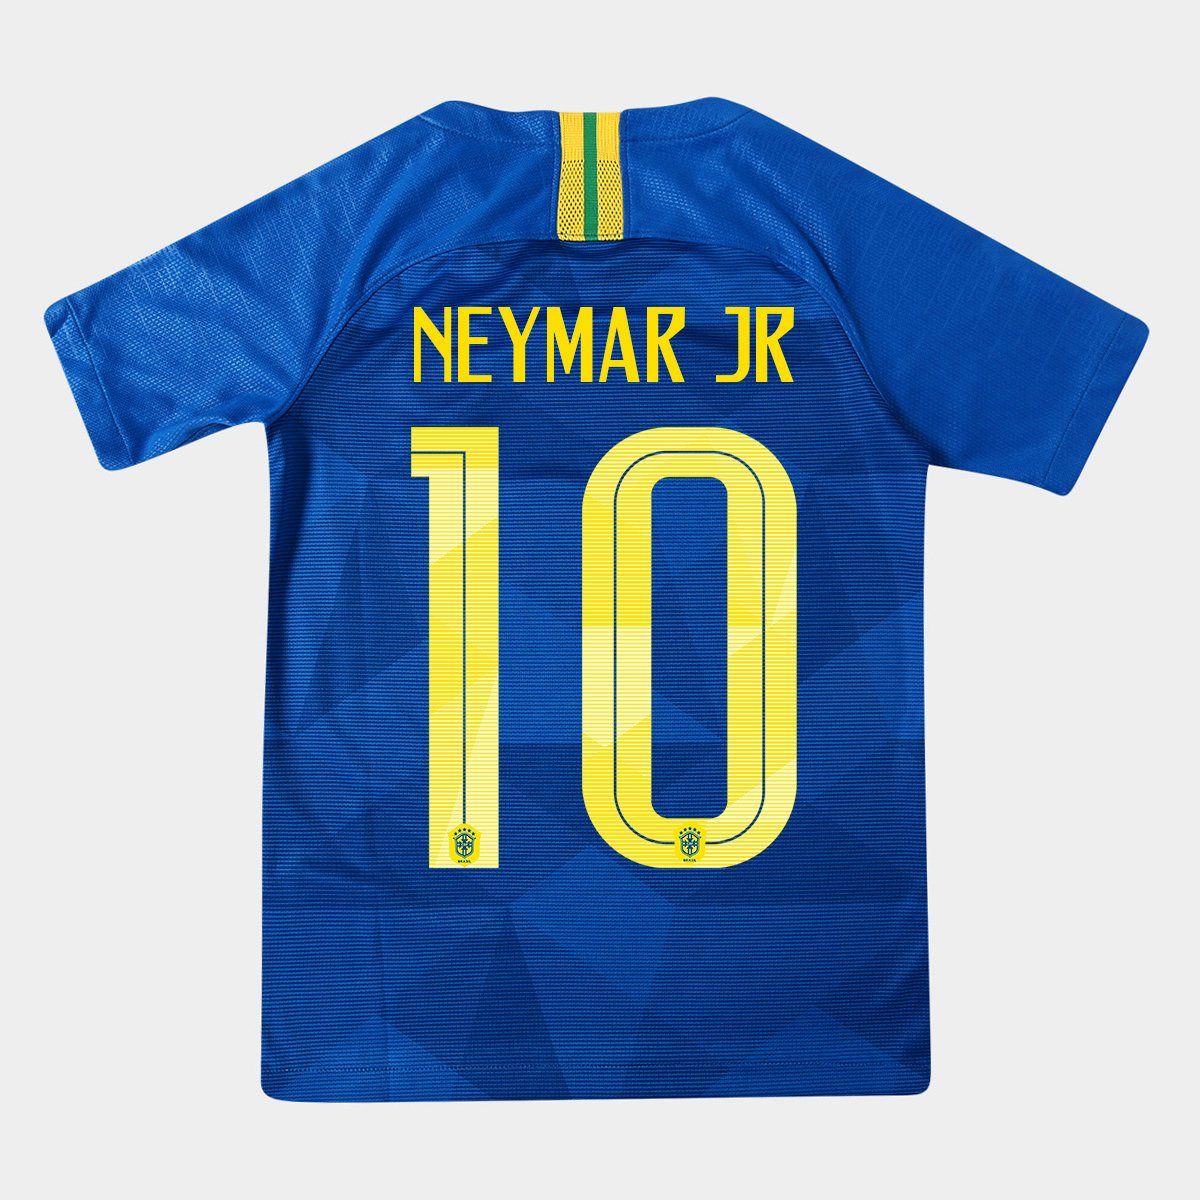 821c90ea64 Camisa Seleção Brasil Juvenil II 2018 nº 10 Neymar Jr - Torcedor Nike ...